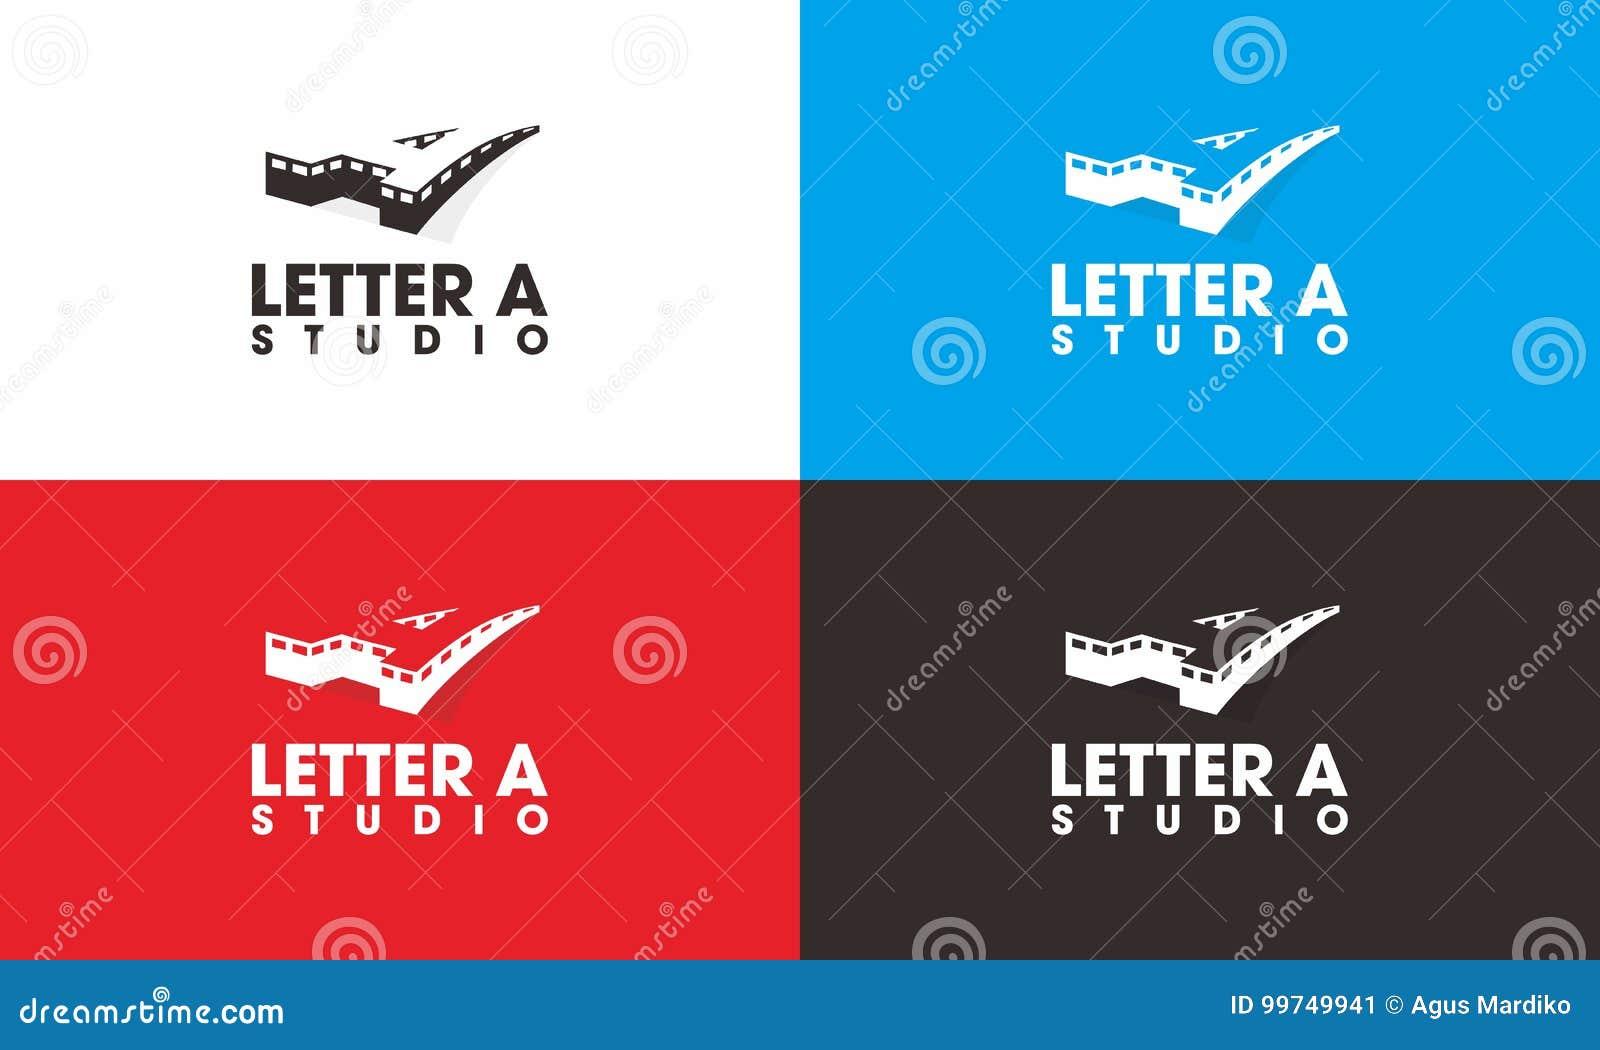 Letter A studio Logo